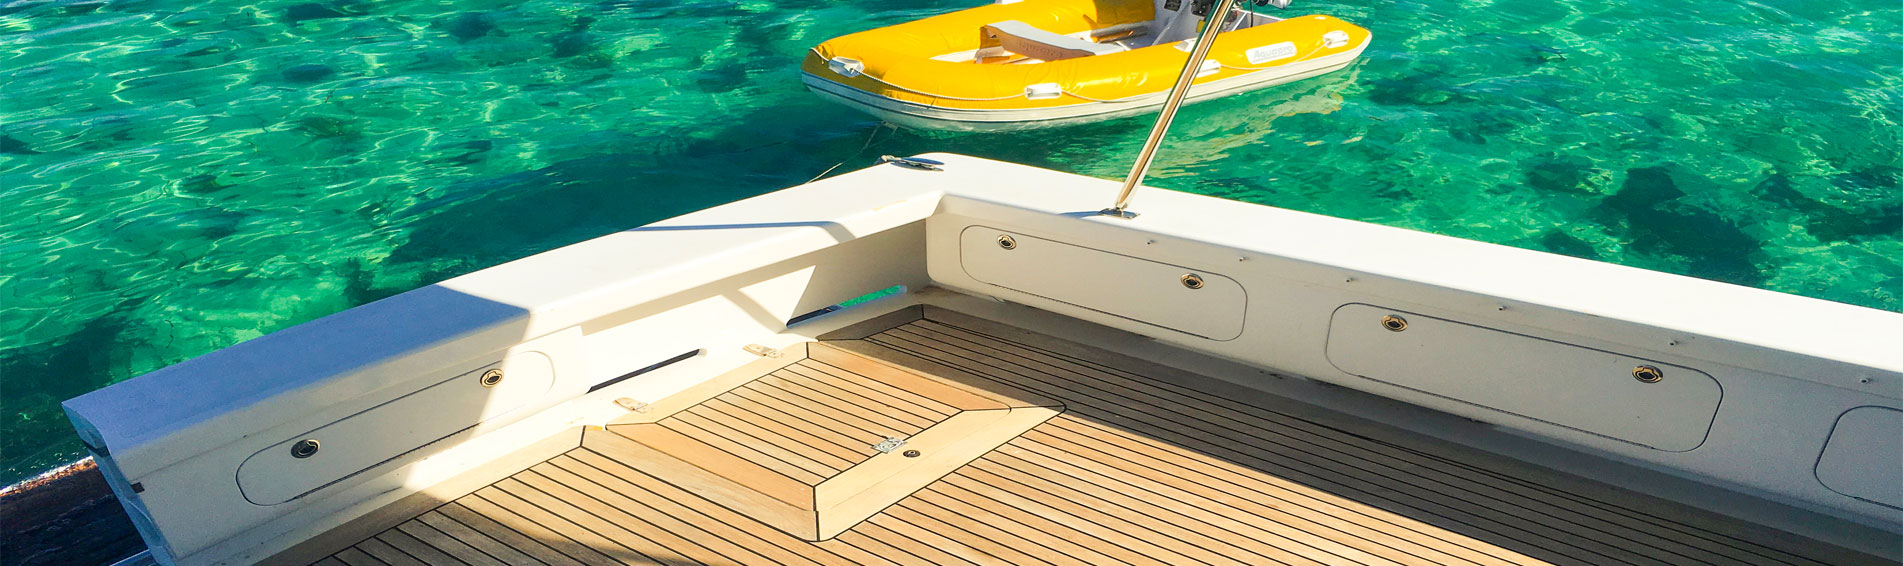 TENACIOUS-back-deck-perth-charters-wa